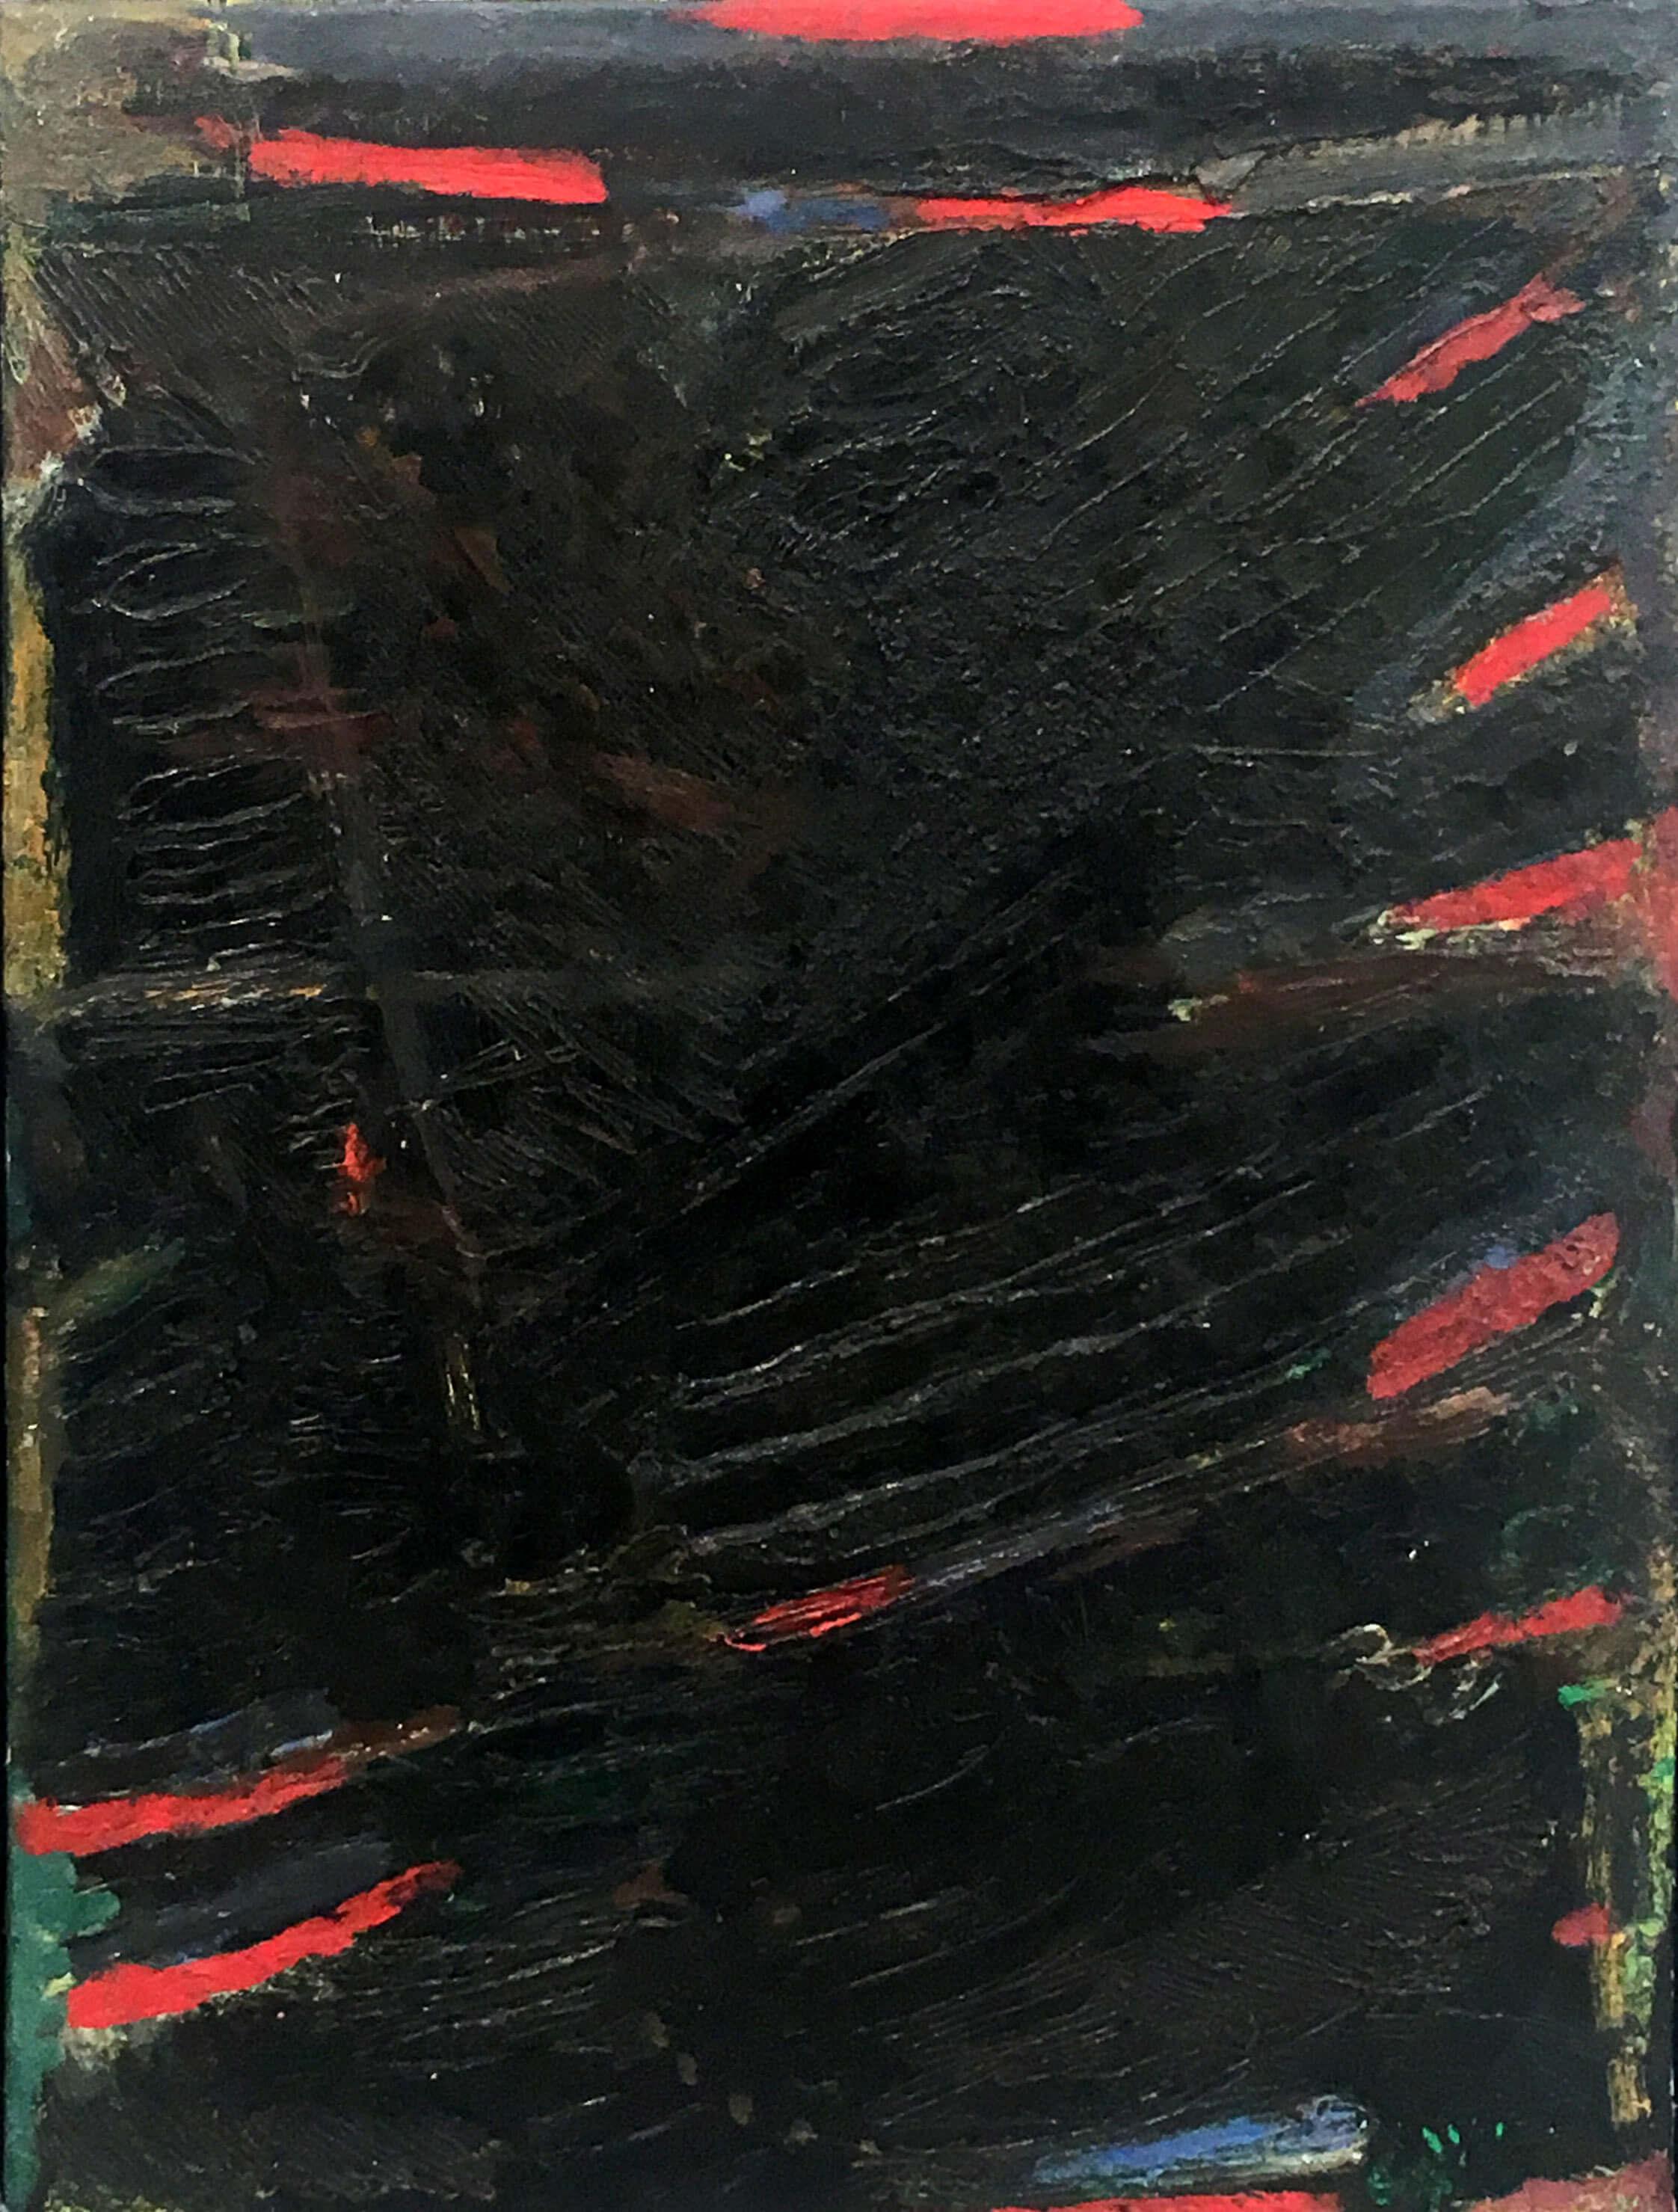 1467_Yehezkel Streichman, 1964, Oil on canvas, 61x41 cm 6,500$-2244x2958